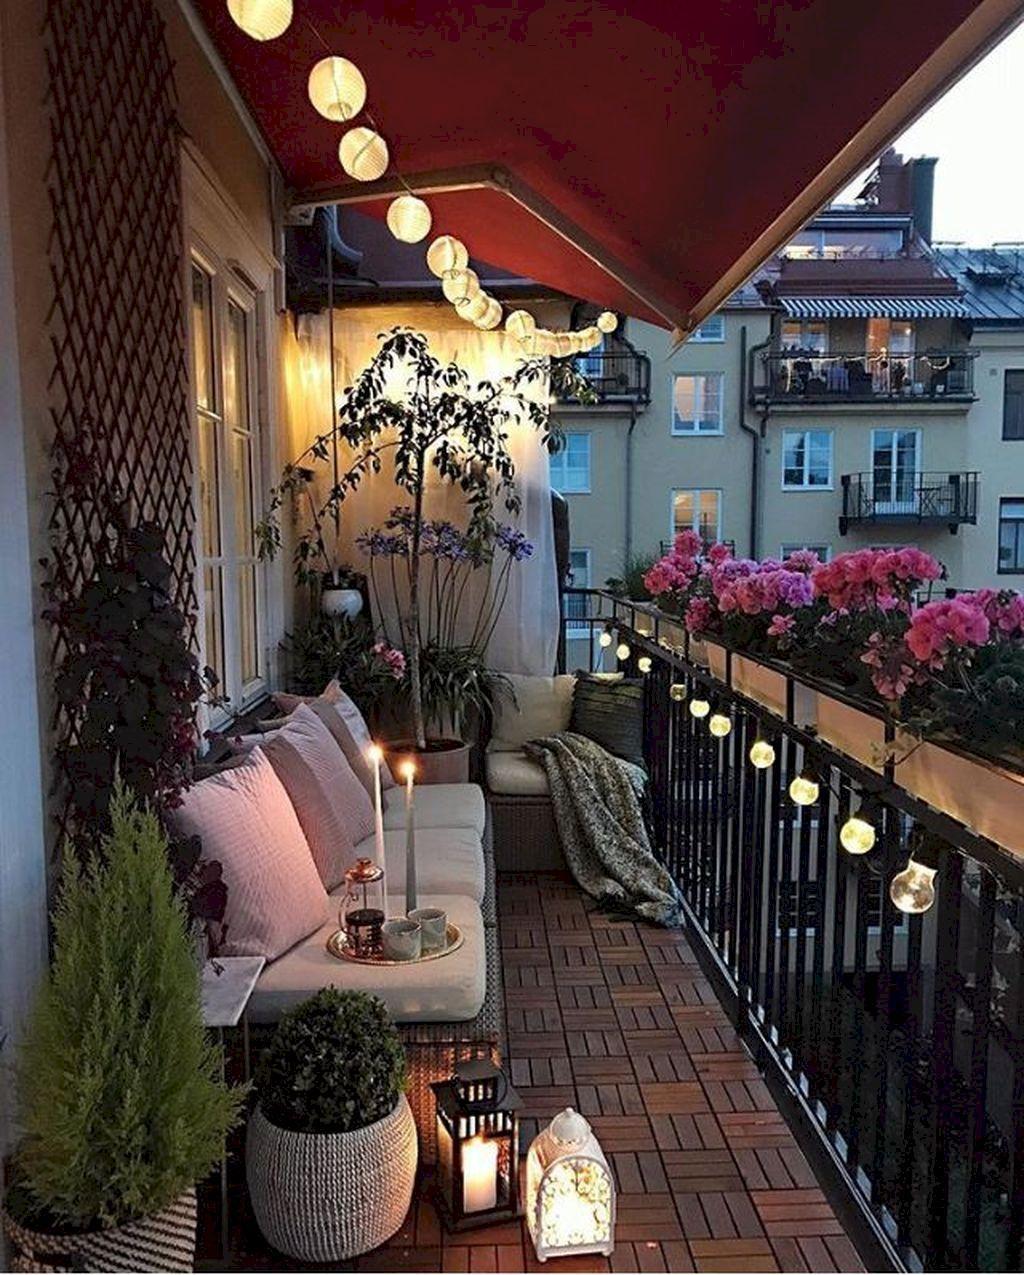 09 Cozy Apartment Balcony Decorating Ideas On A Budget